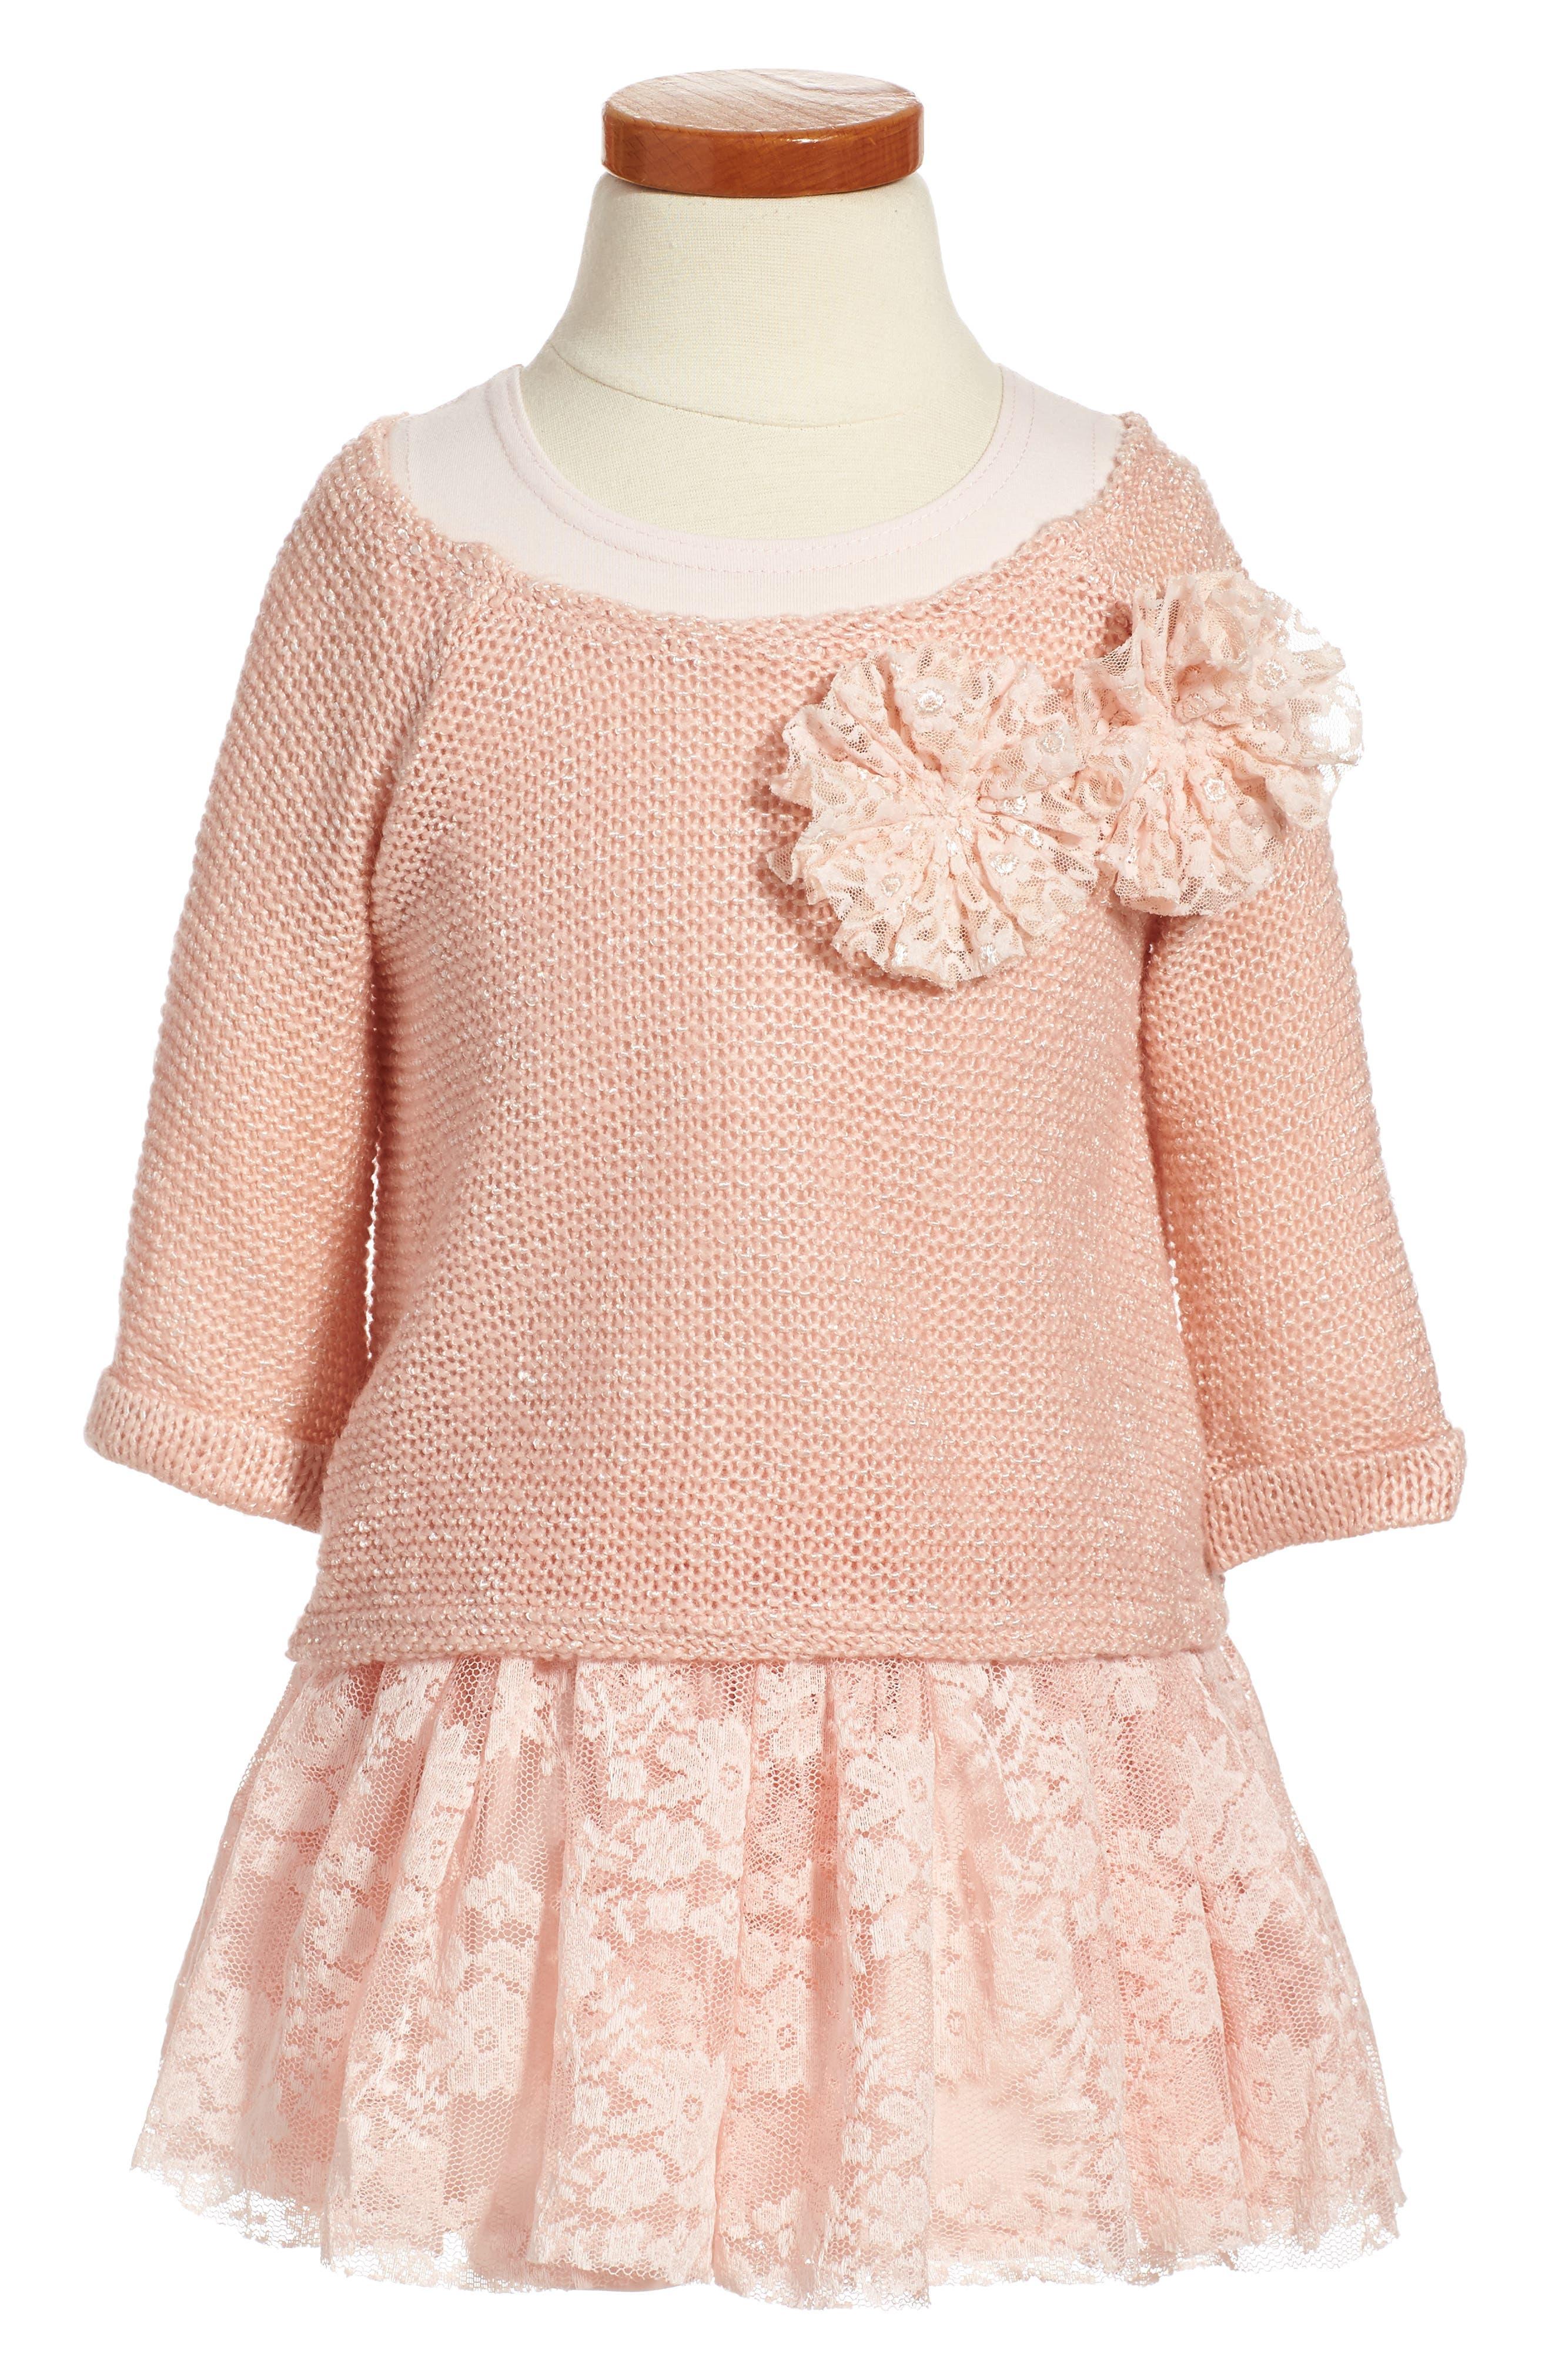 Main Image - Pippa & Julie Sweater & Lace Skirt Dress (Toddler Girls, Little Girls & Big Girls)